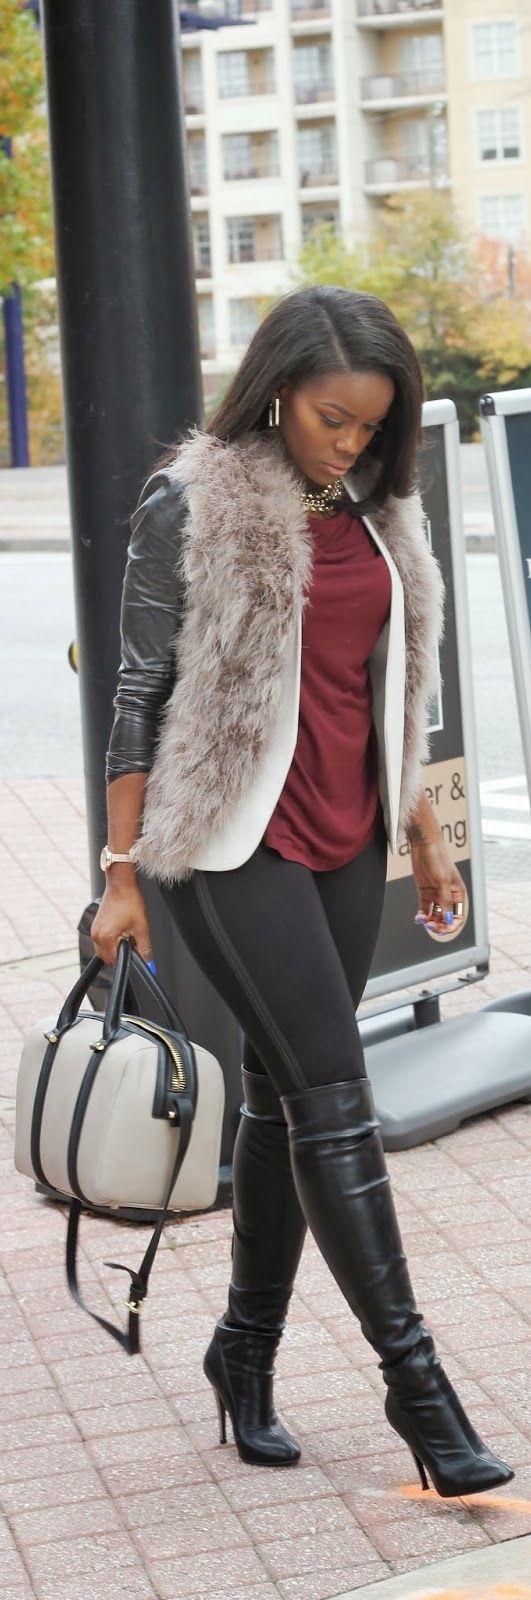 Faux Fur & Leather  Vest | Forever 21Blazer | H&MTop + Pants | ZaraHandbag | ZaraBoots | Nine West Fashion Trend by Lover4Fashion